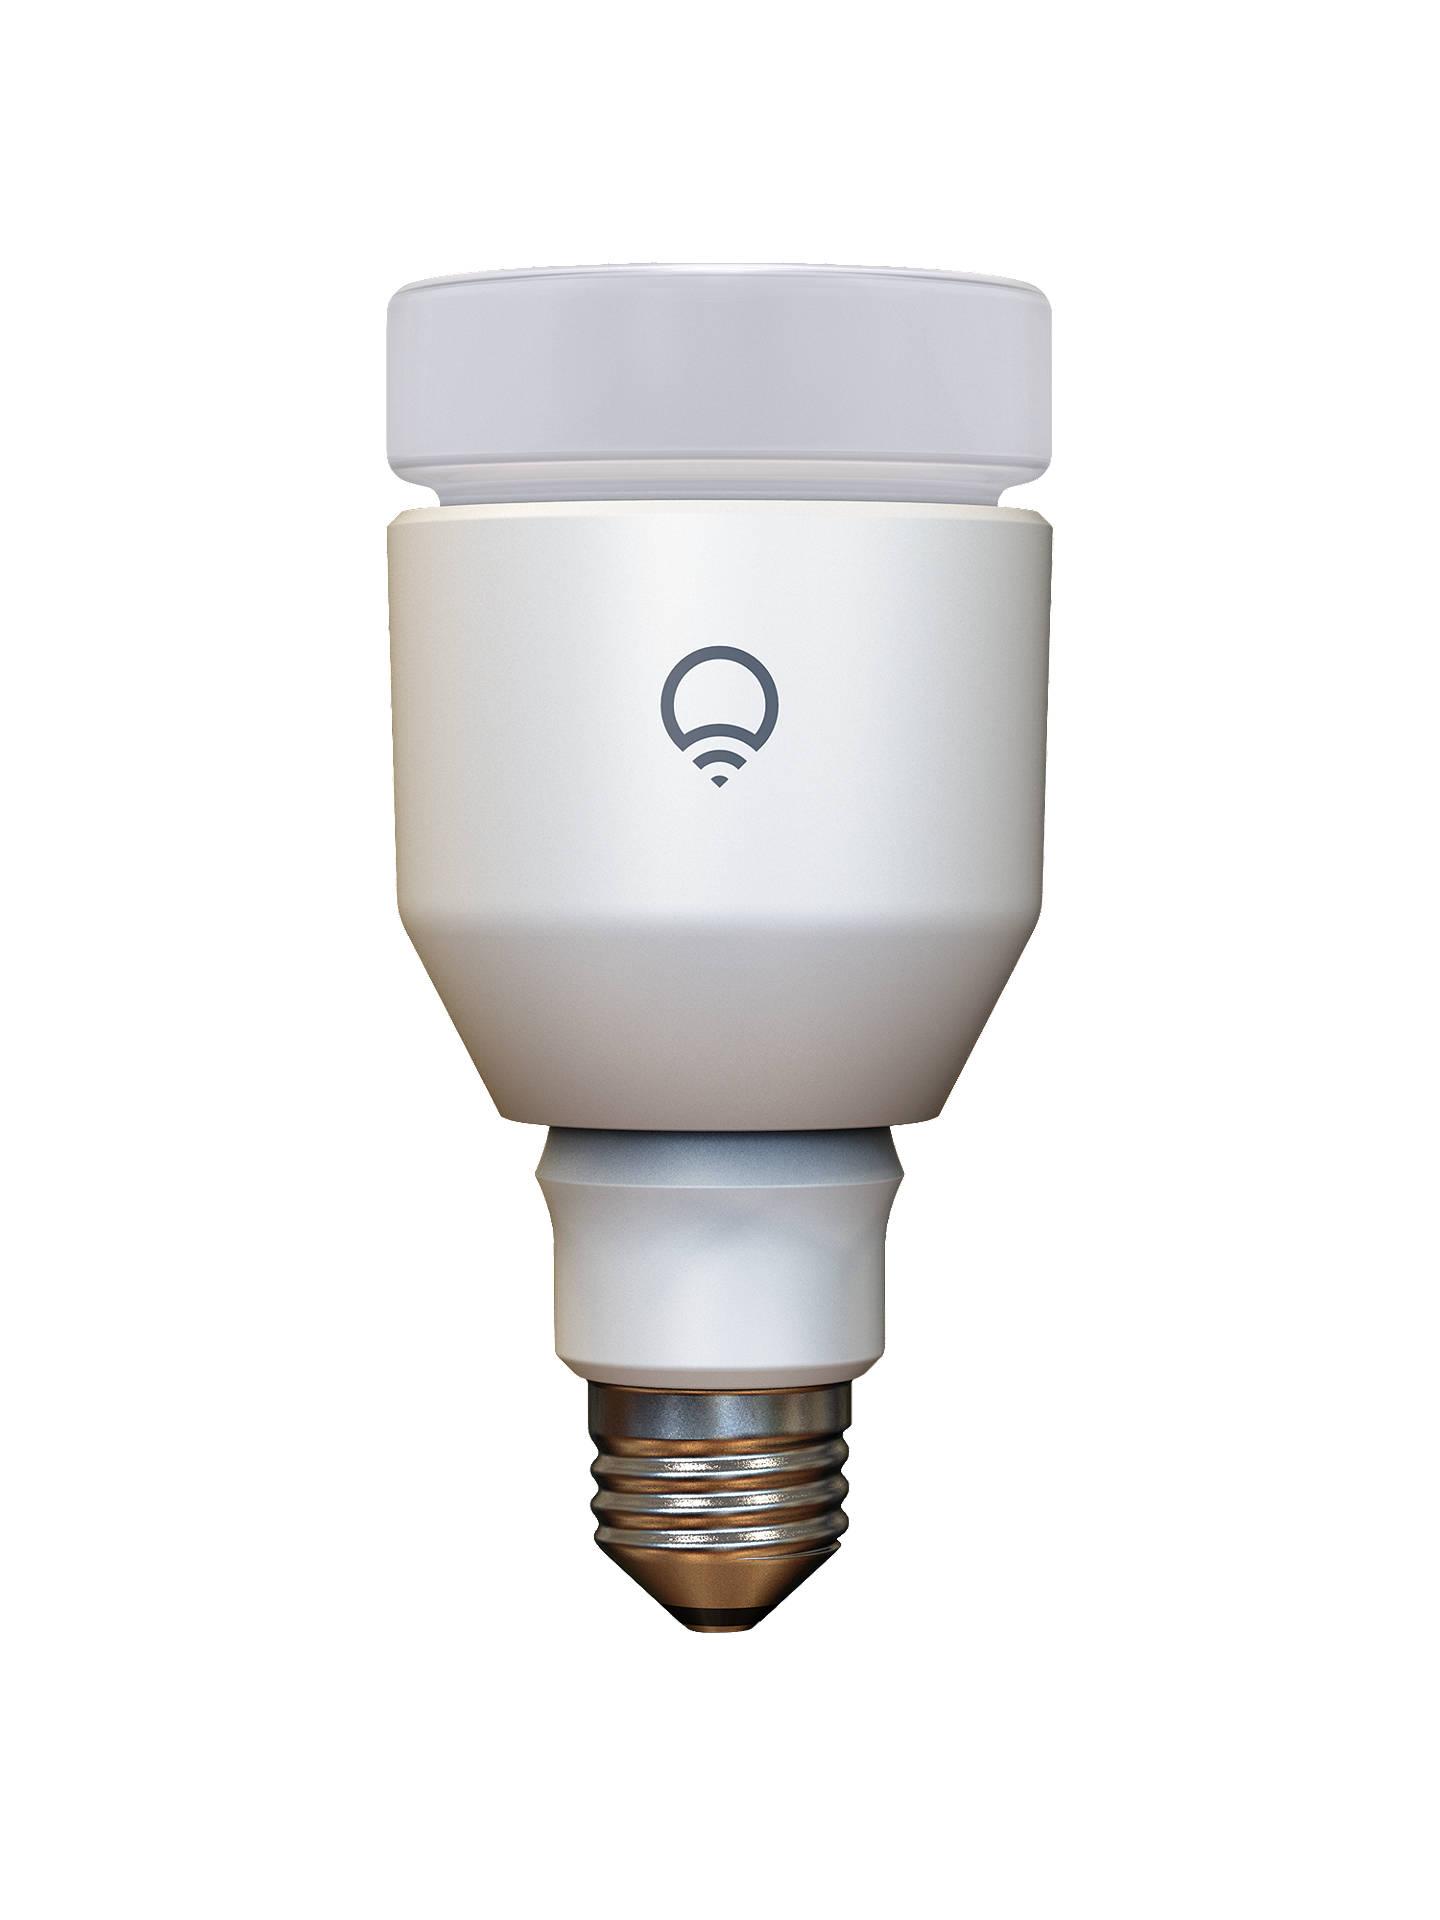 LIFX 17W ES Wi-Fi LED Intelligent Light Bulb, Multi at John